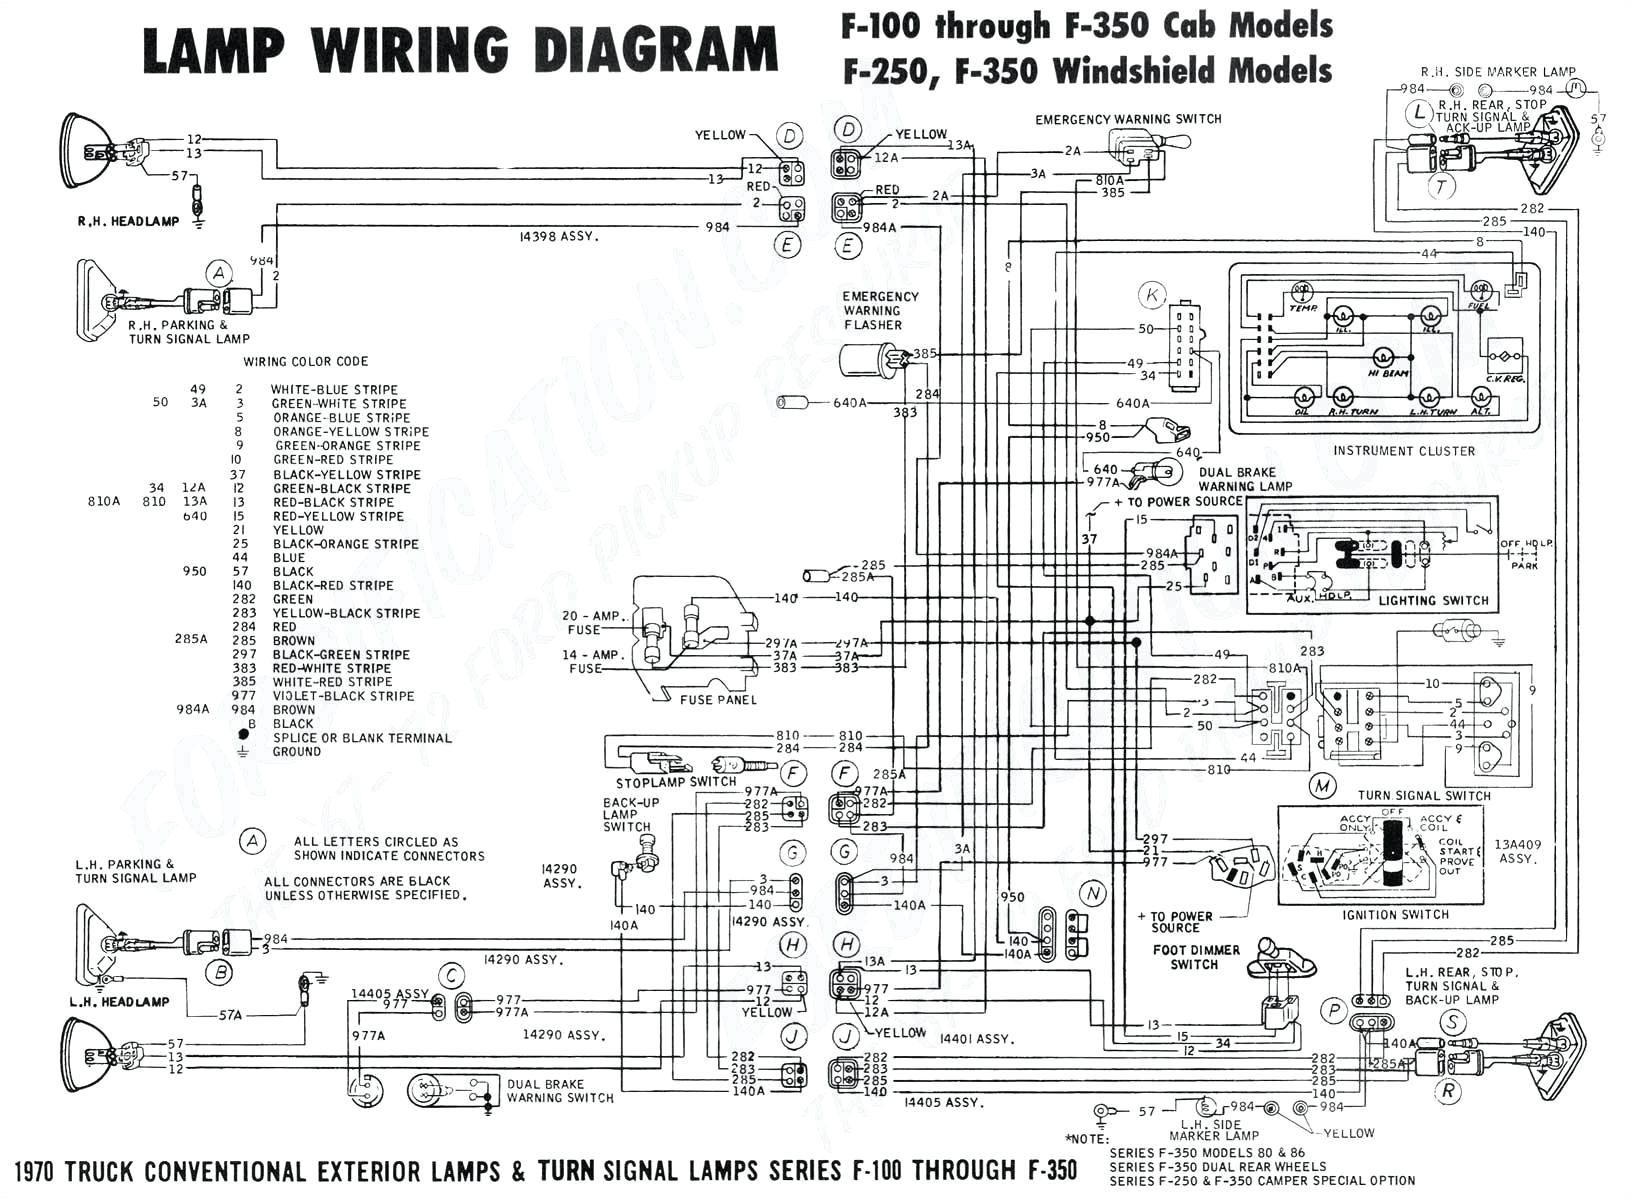 heartland rv wiring diagram collection wiring diagram sample jpg